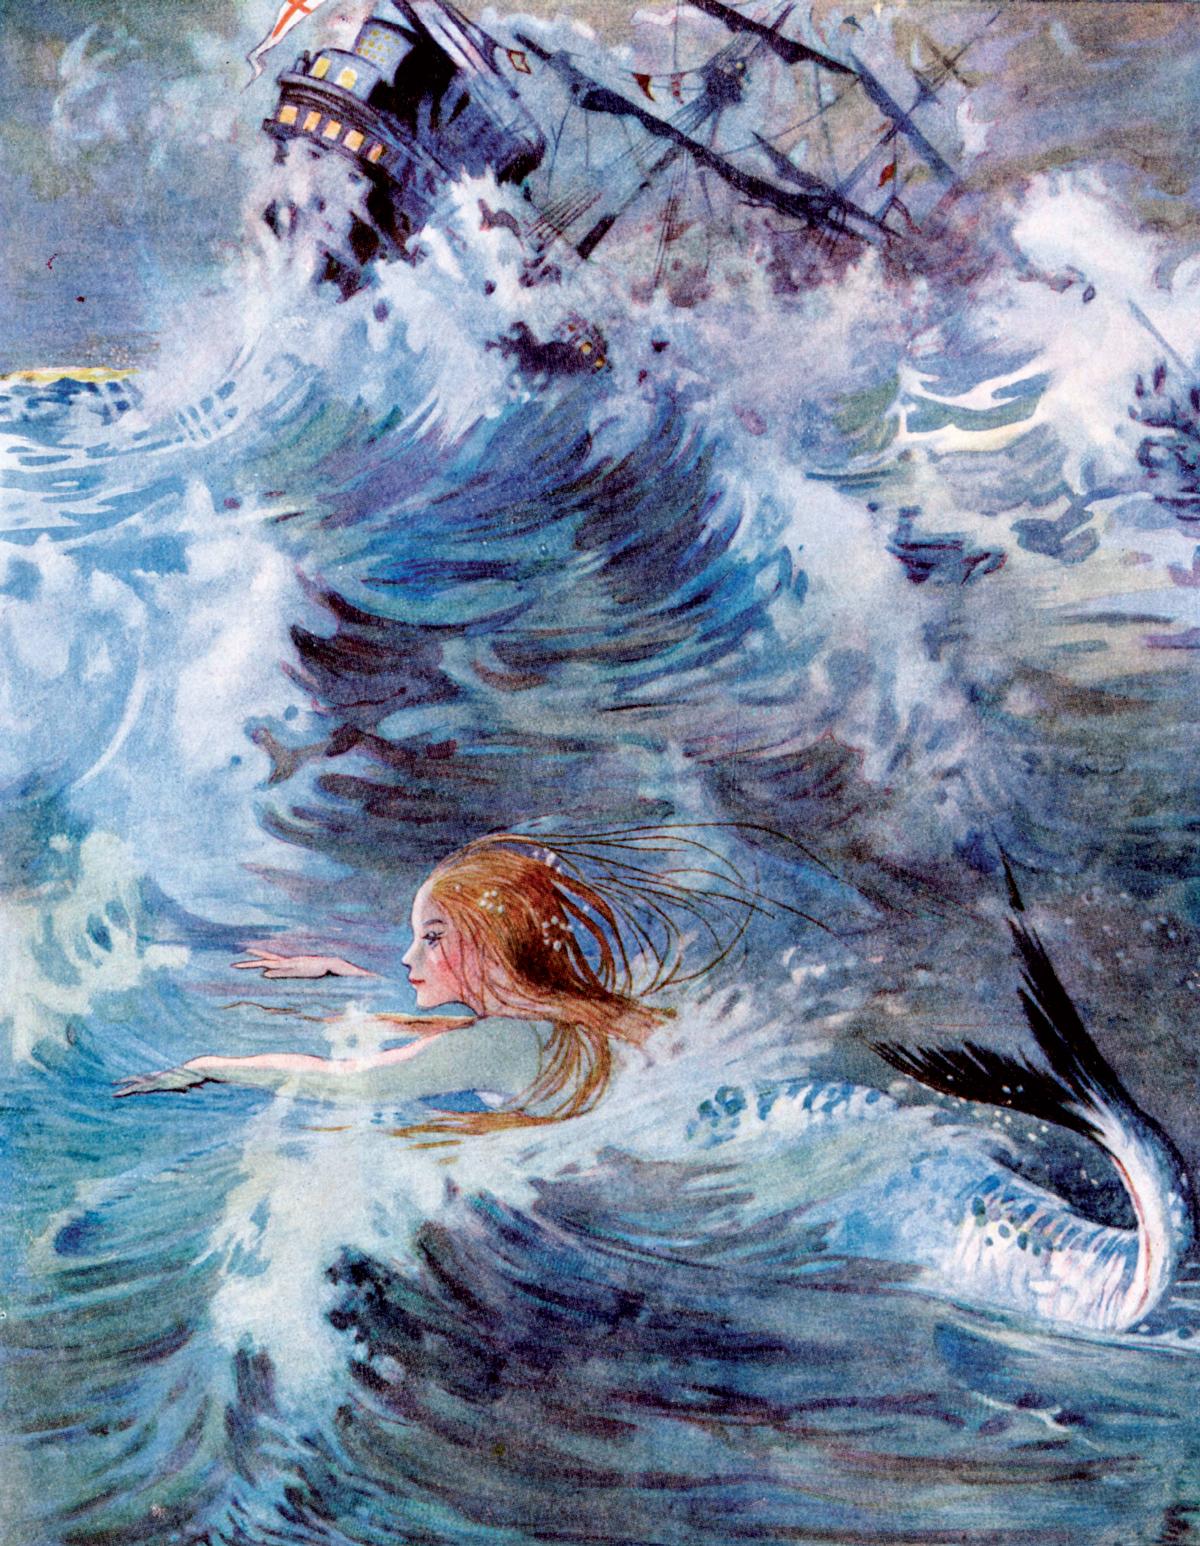 The Little Mermaid illustration by Honor C. Appleton